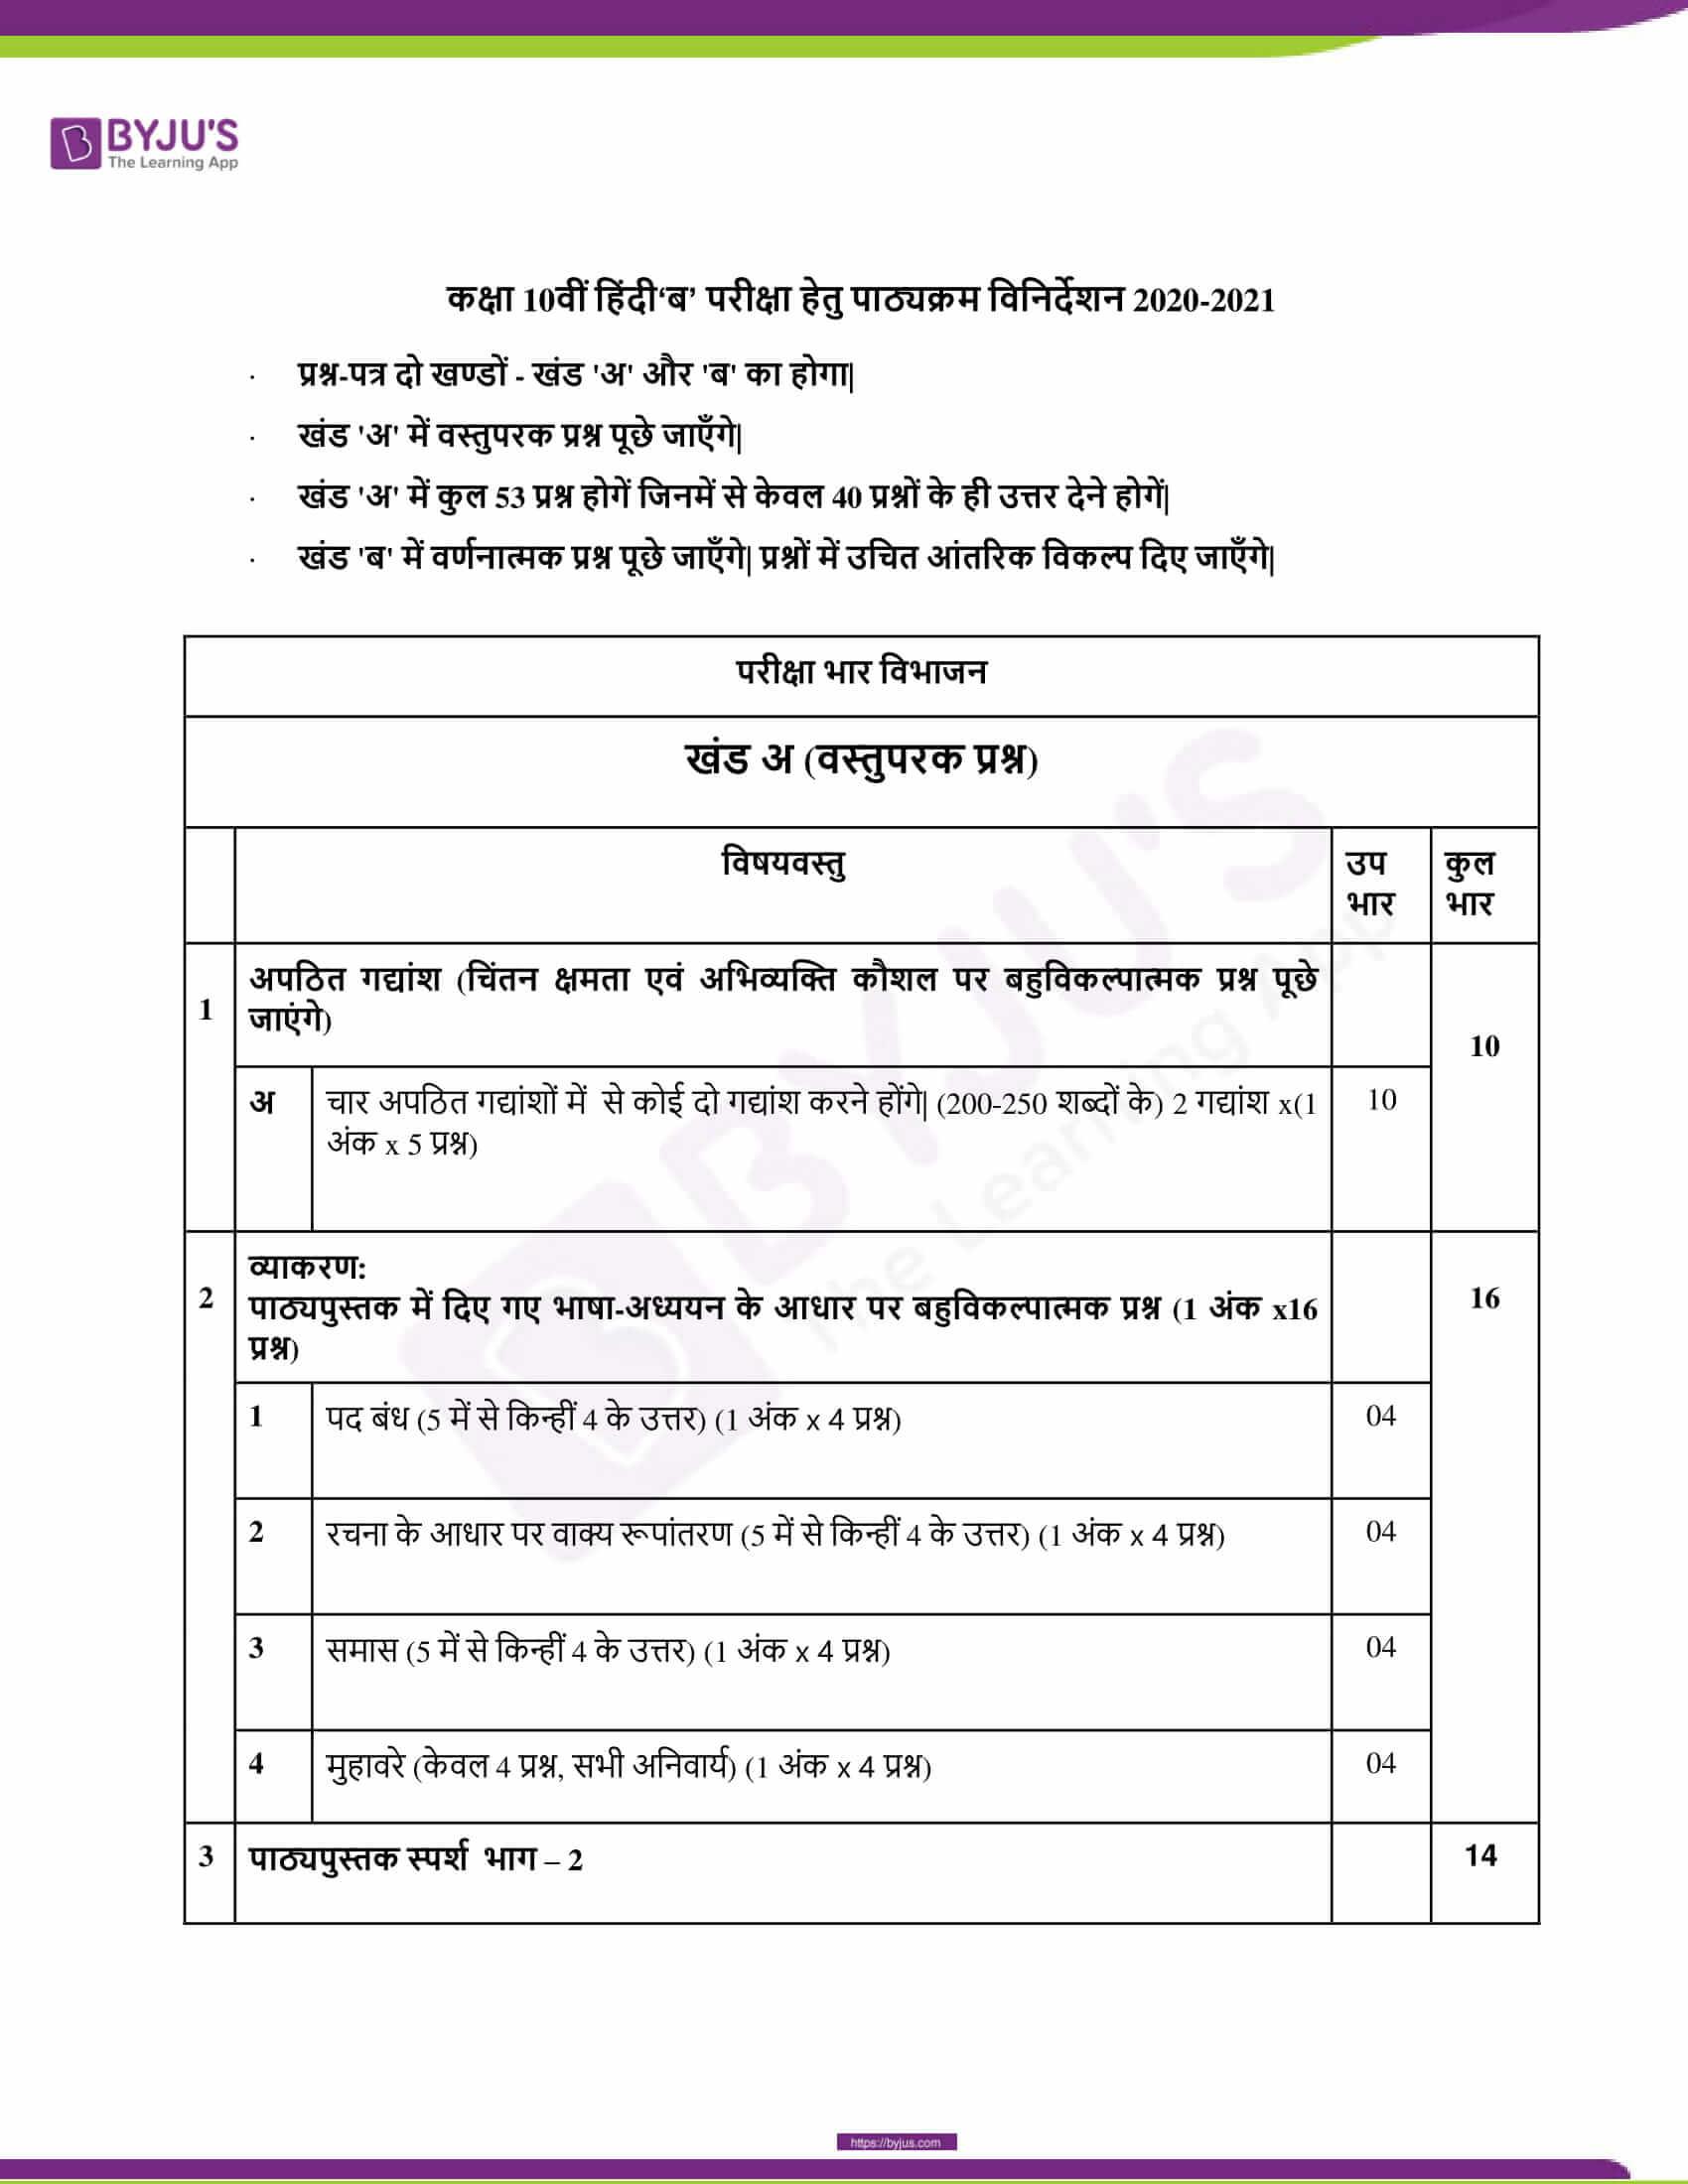 CBSE Class 10 Hindi Course B Revised Syllabus 2020 21 12